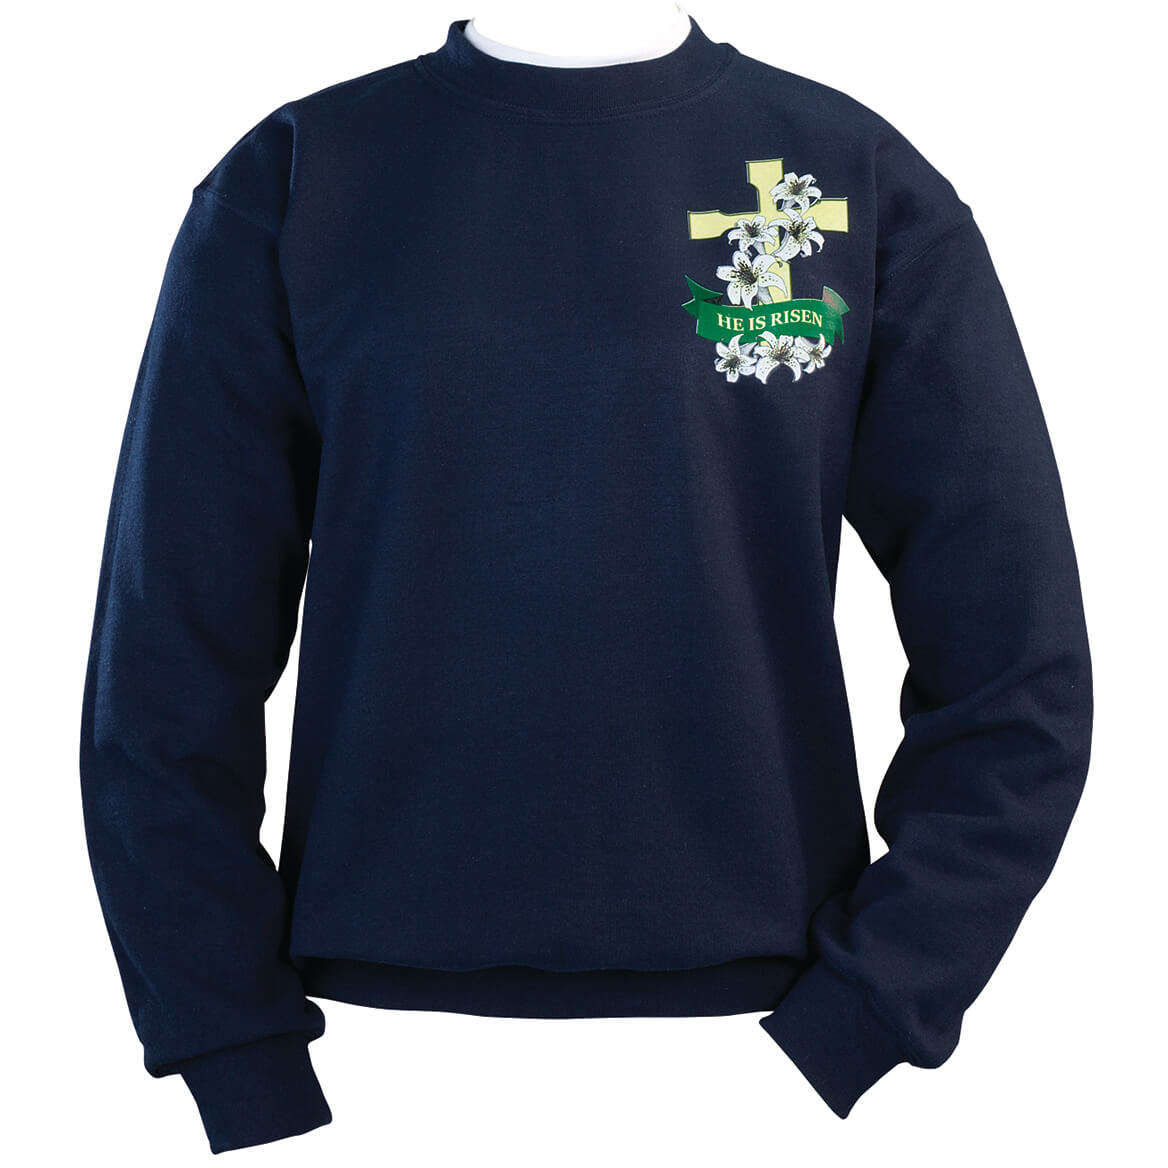 He Is Risen Sweatshirt Small-XXL